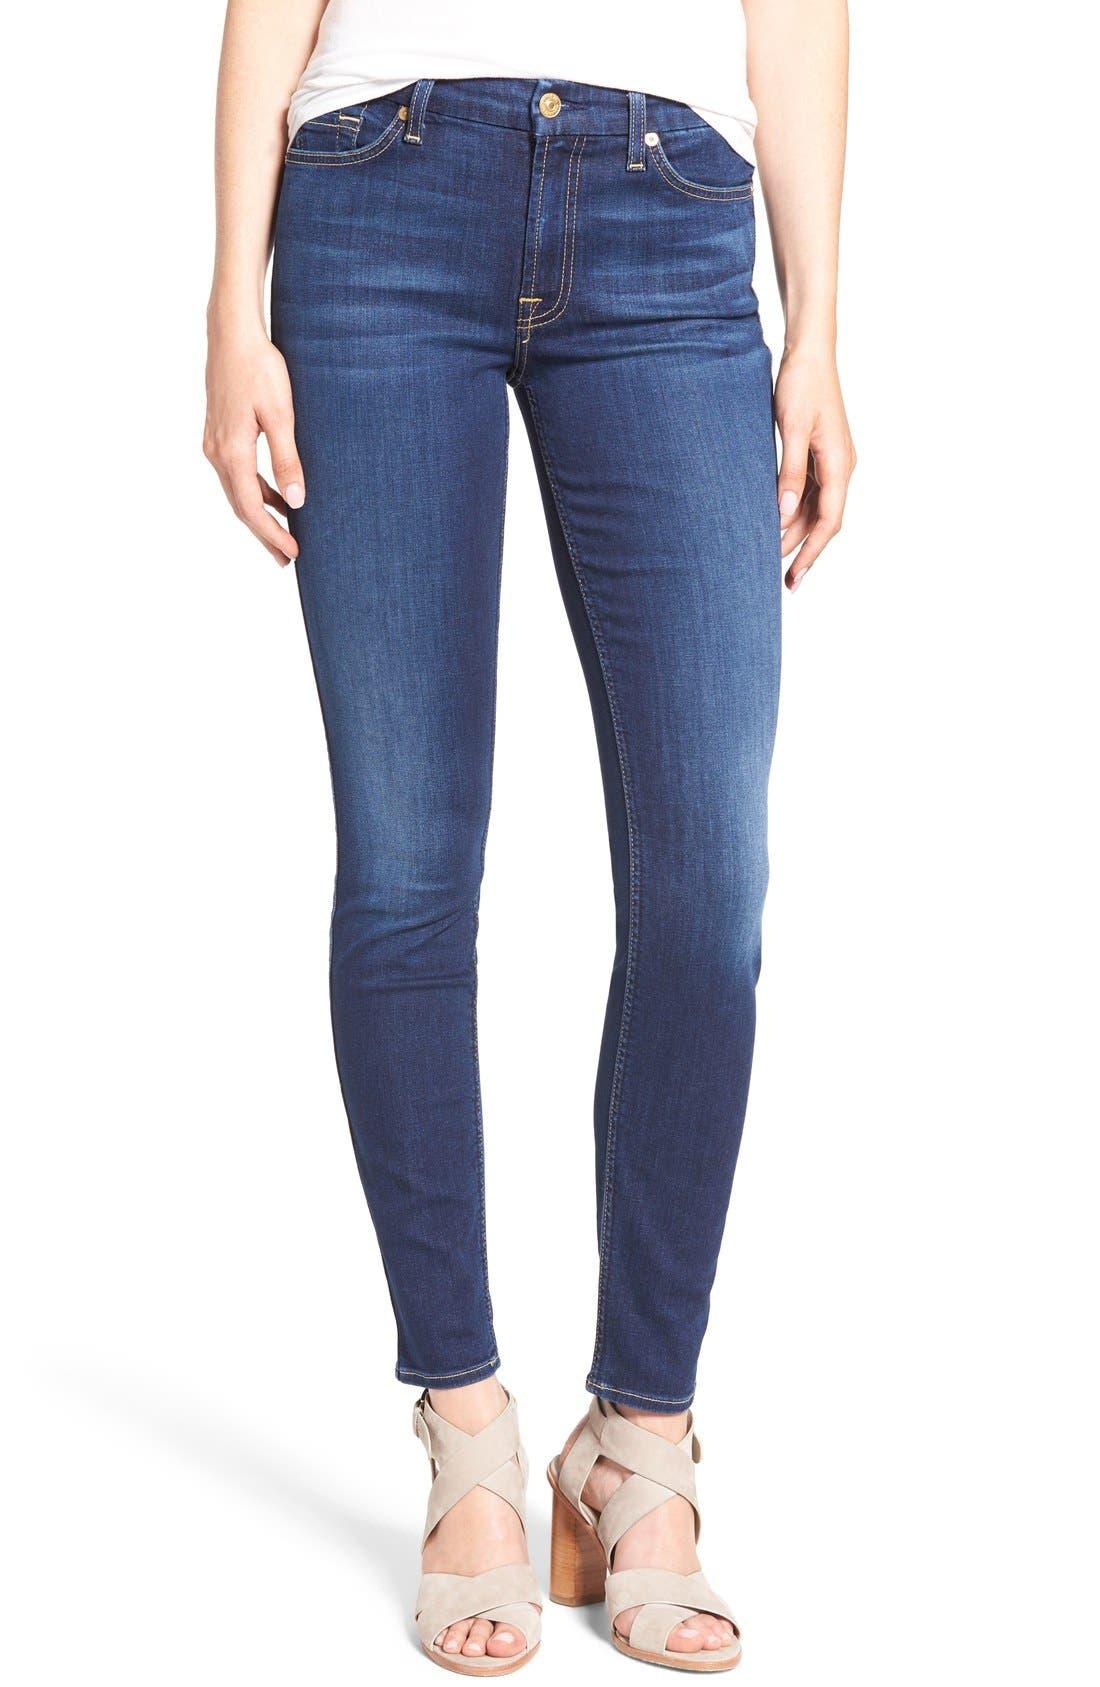 'b(air) - The Skinny' Skinny Jeans,                         Main,                         color, Duchess